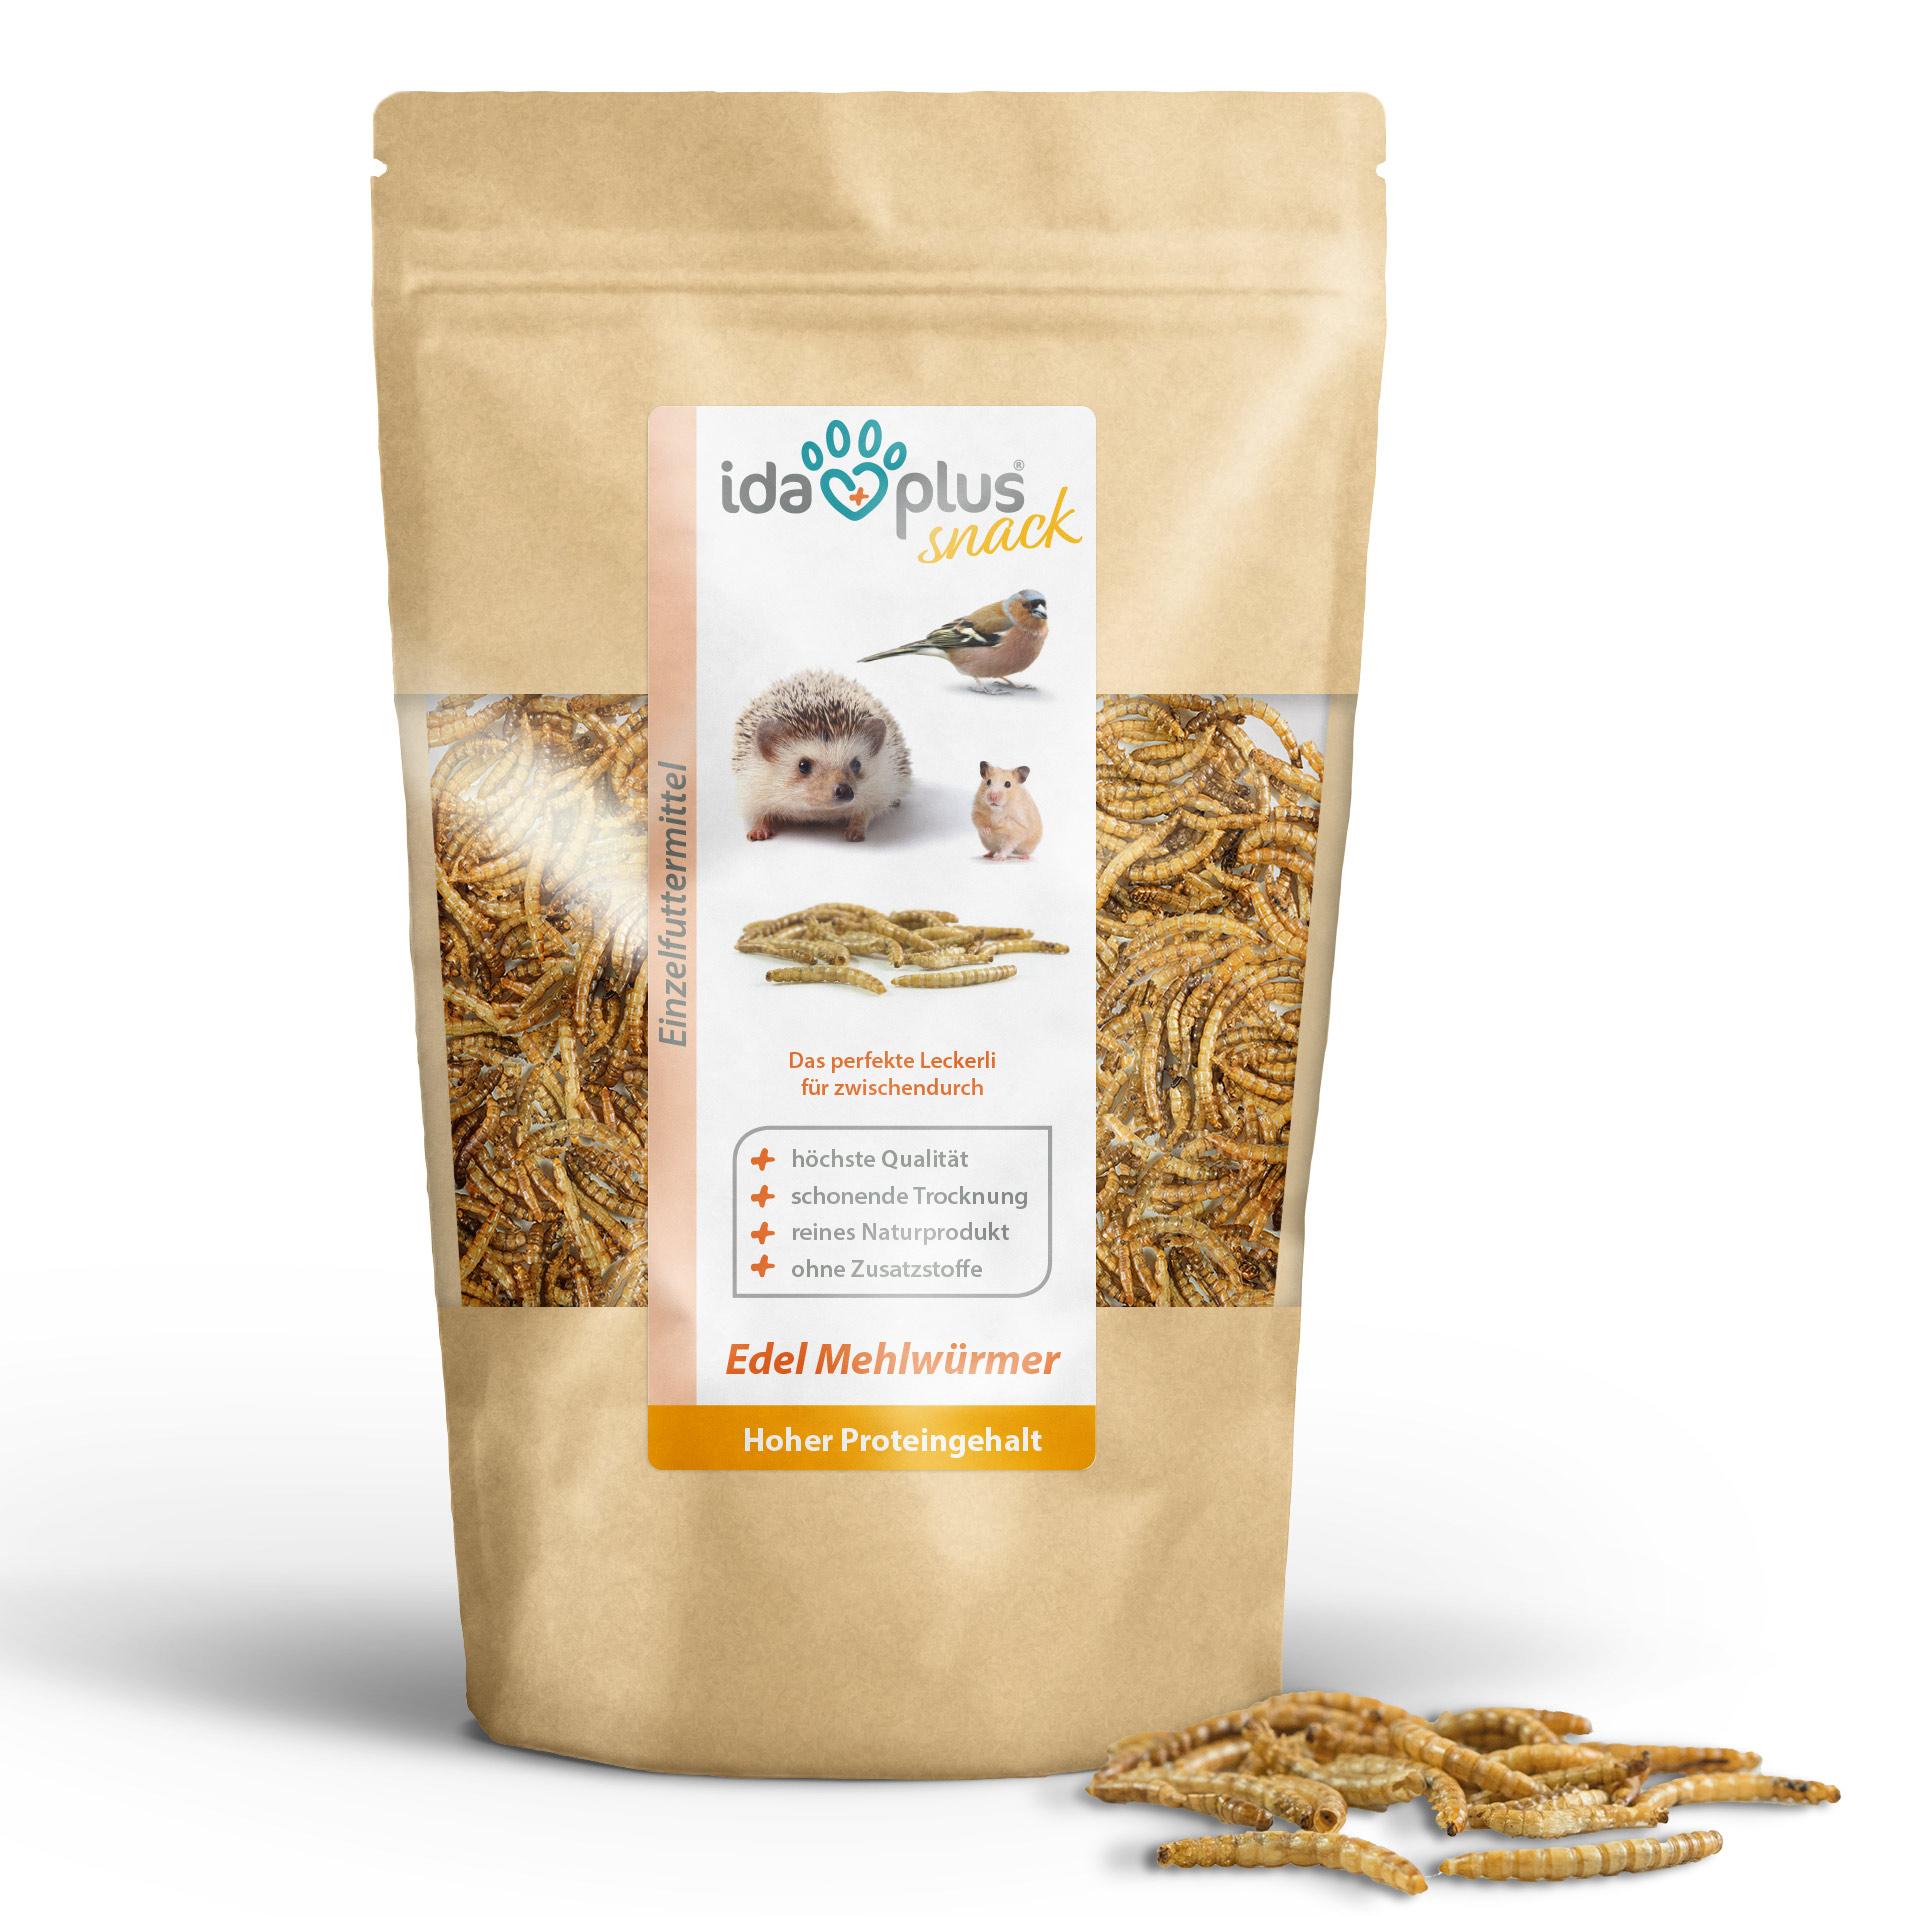 Mehlwürmer getrocknet - Insekten Snack für Igel, Hamster und Reptilien - 100 g